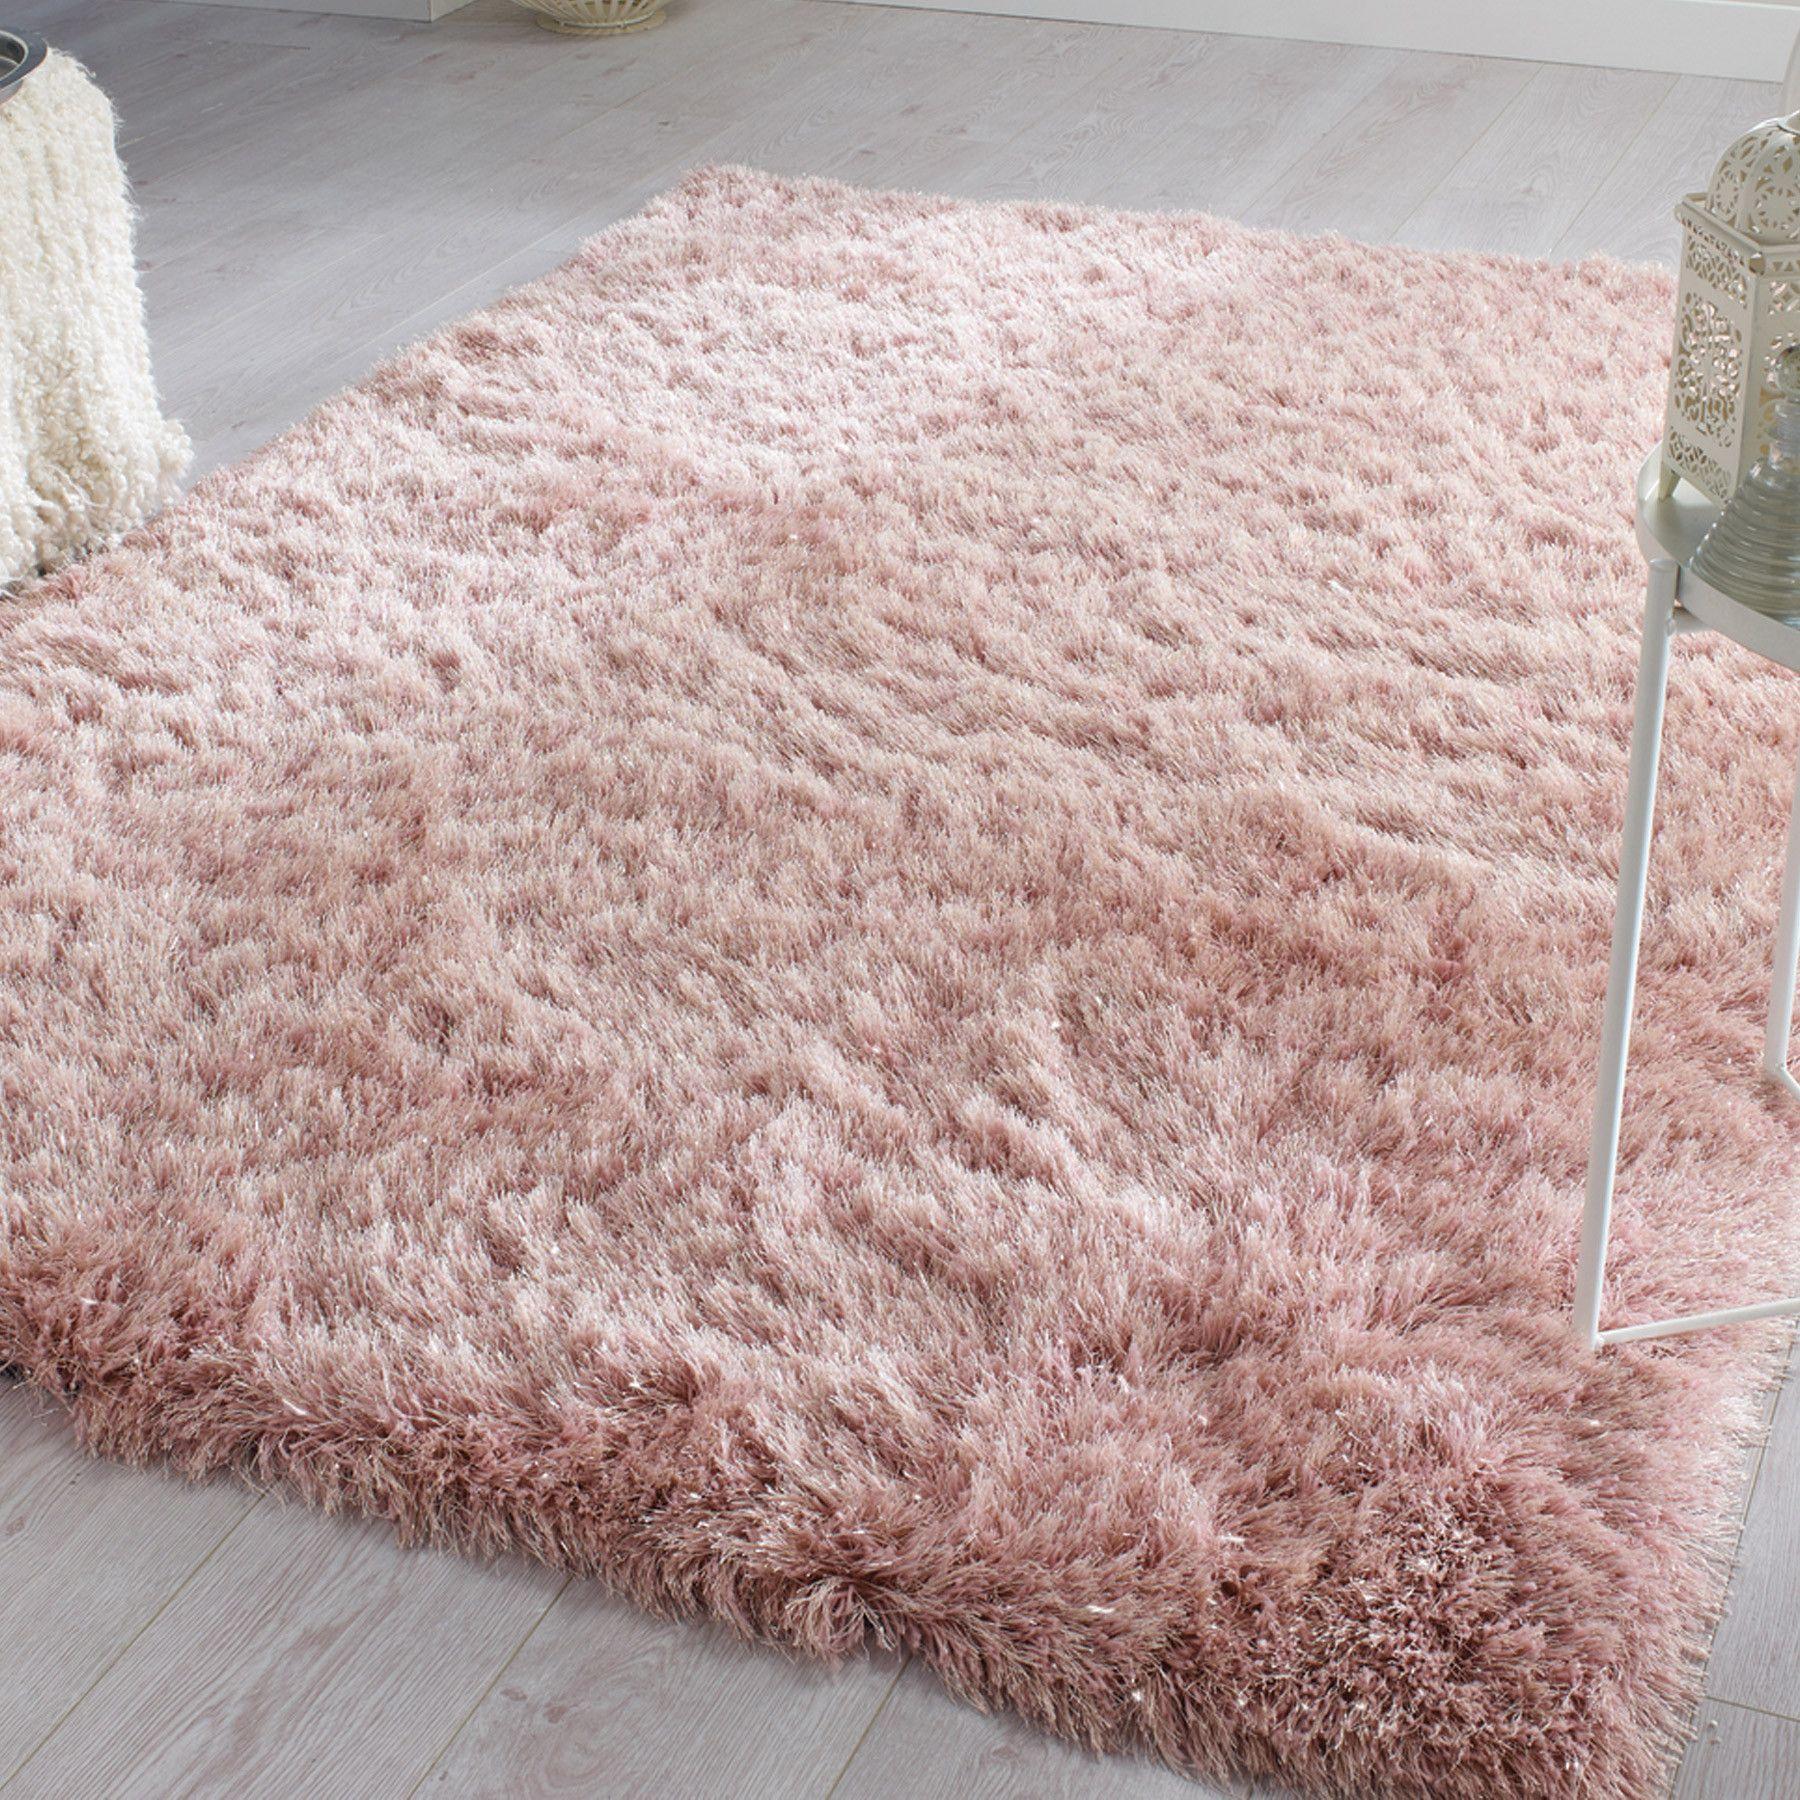 Glitz Pink Rug Pink Rugs Bedroom Blush Pink Bedroom Dusty Pink Bedroom